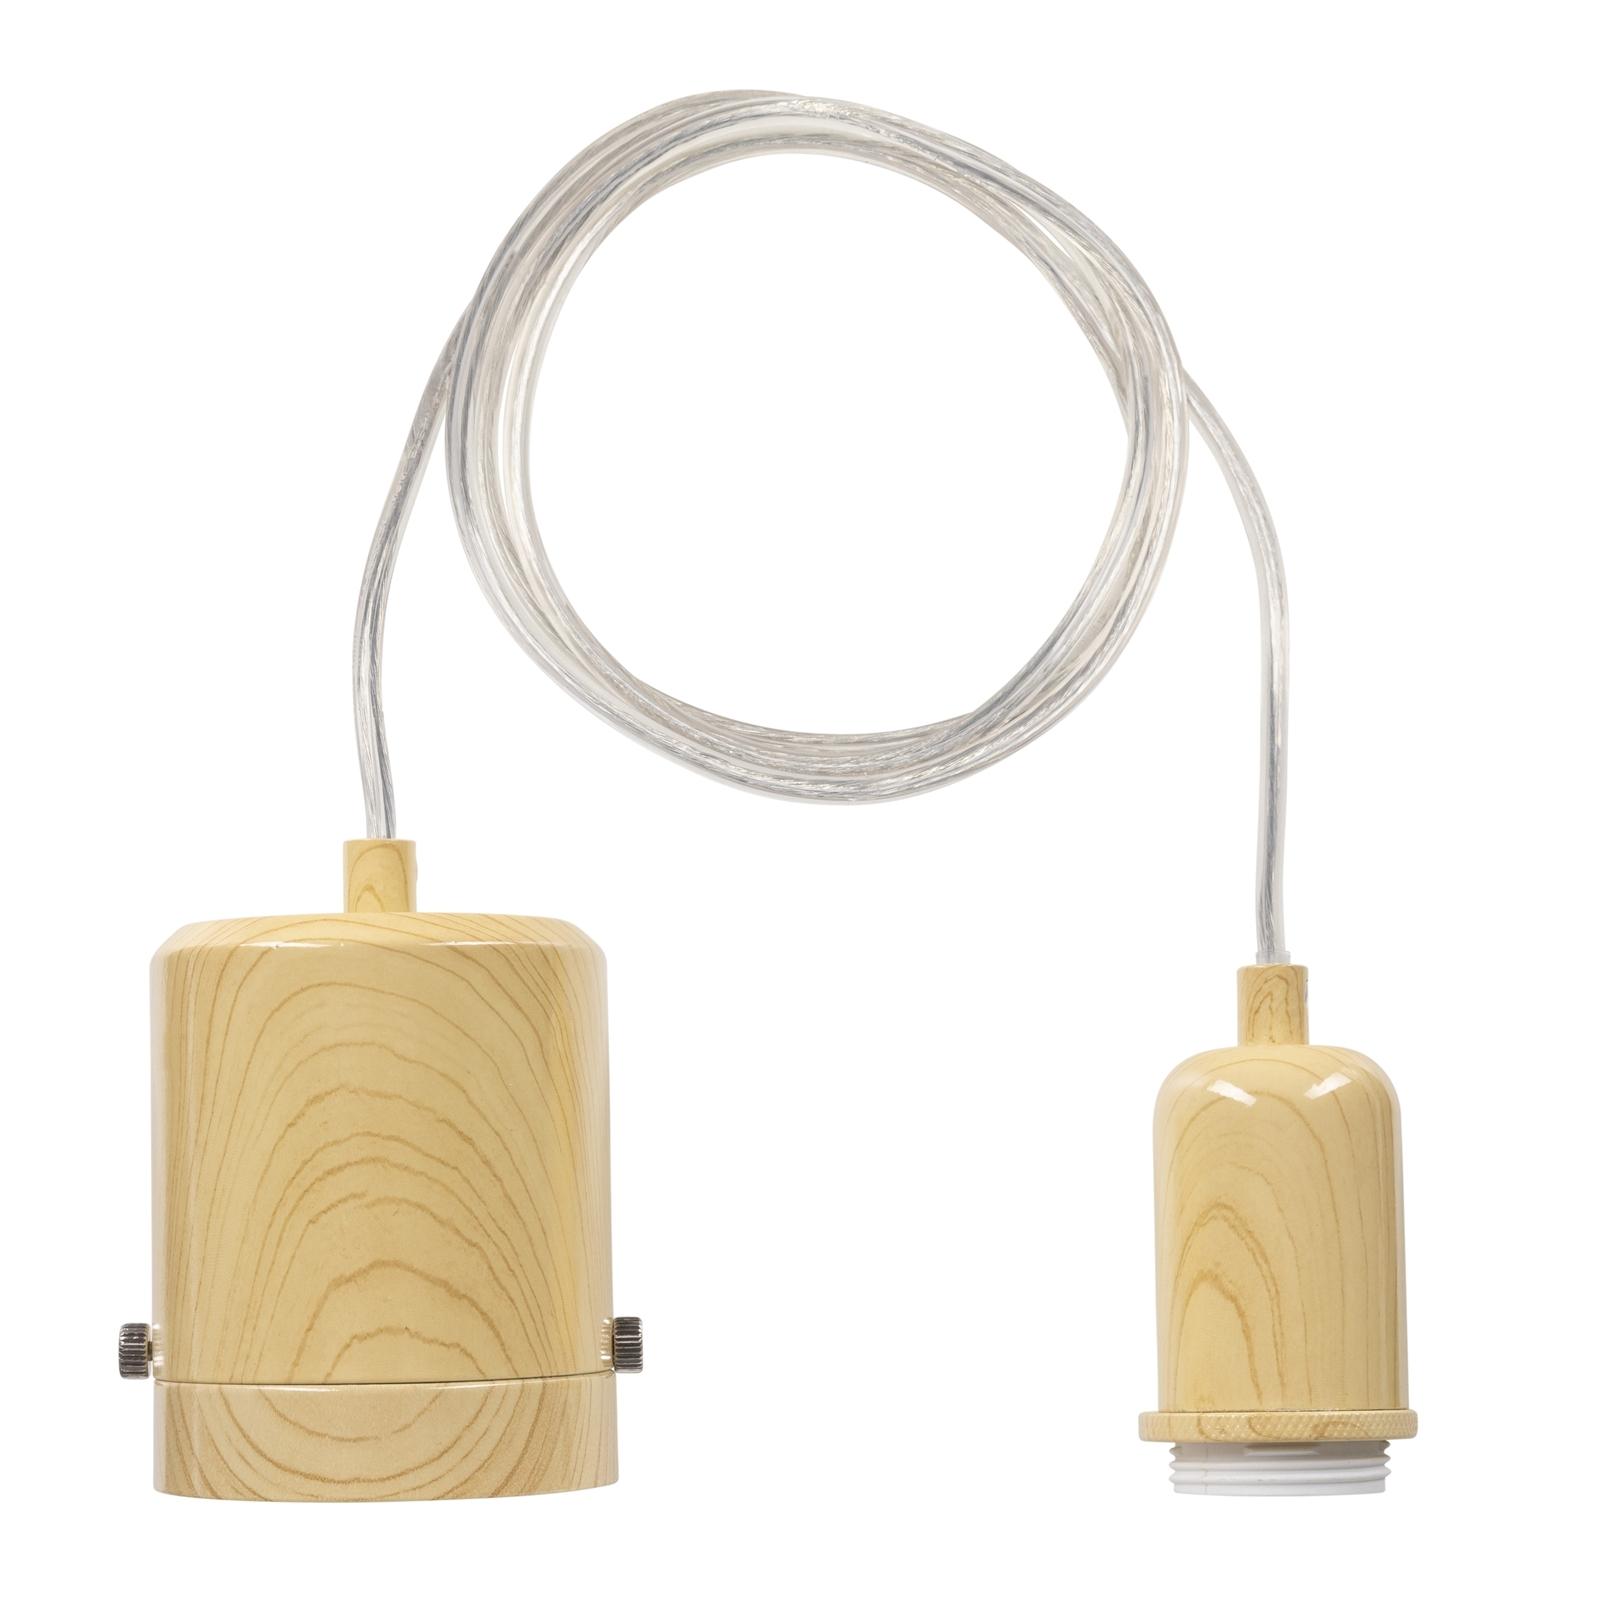 Brilliant Timber Look Maggie Plug-In DIY Shade Holding Suspension Pendant